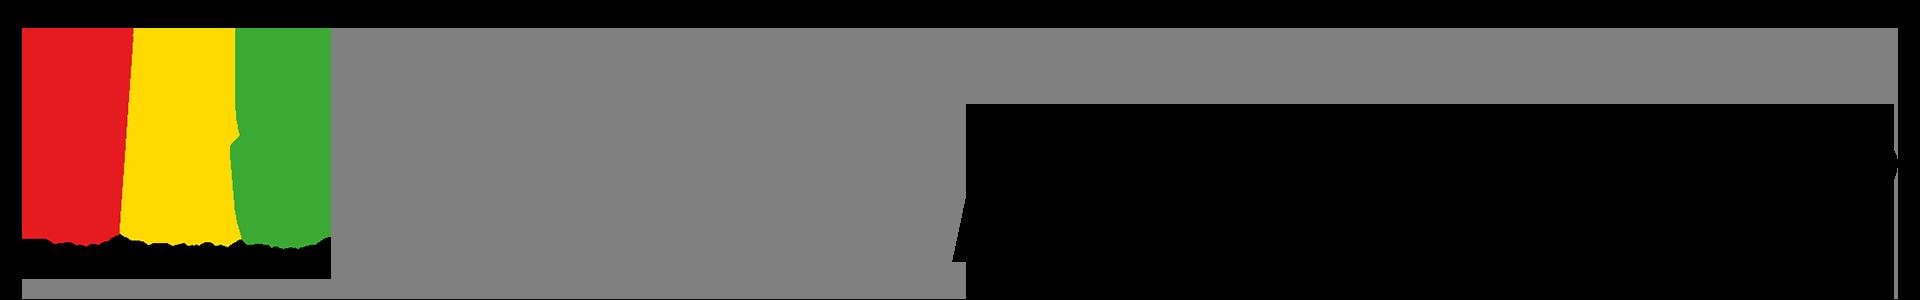 VRS_Manufaktur